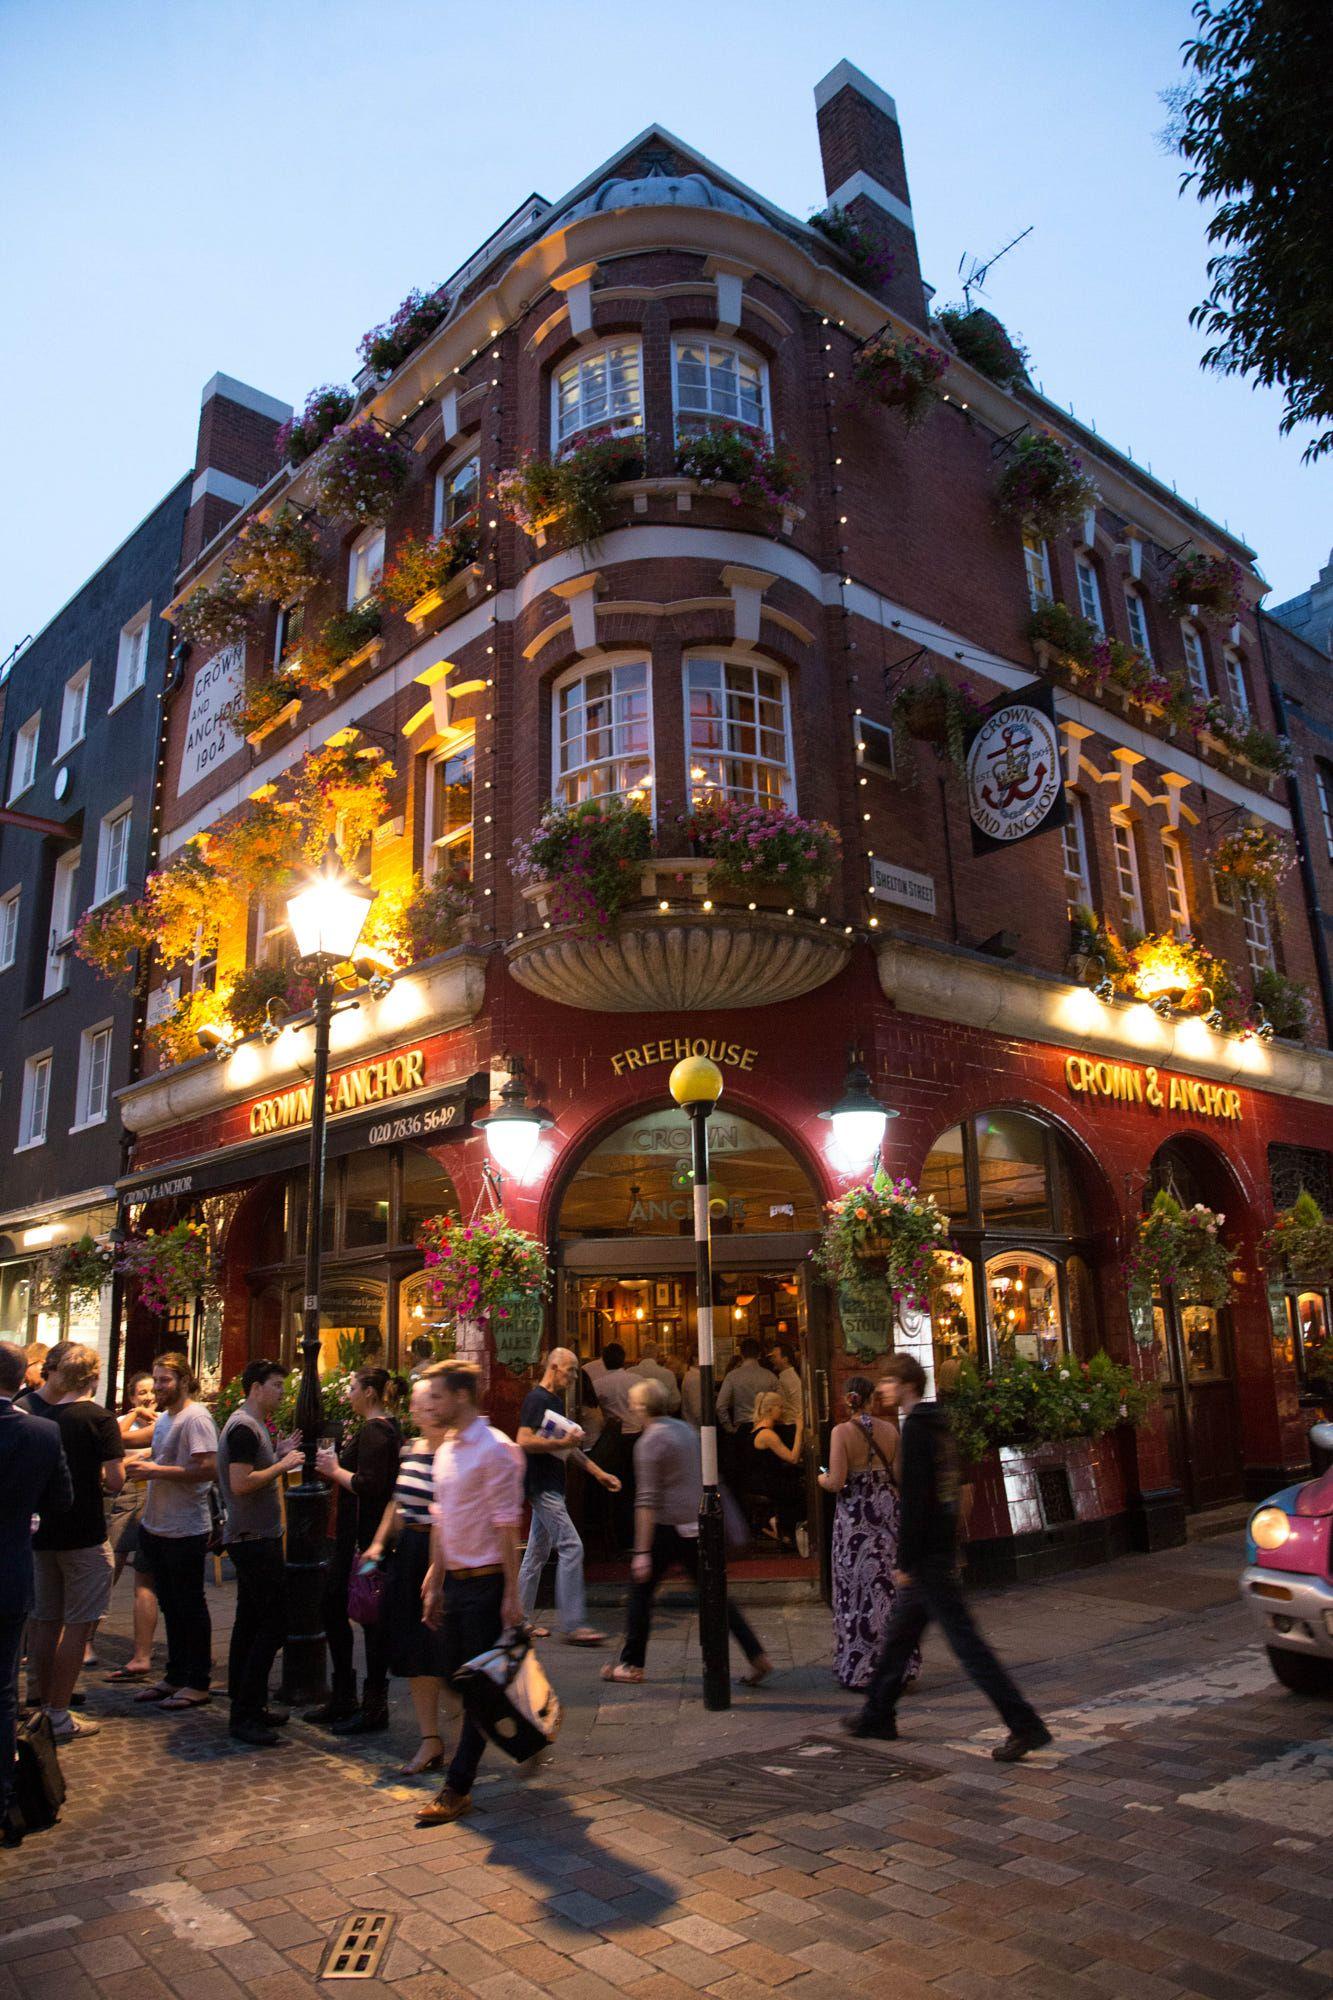 Crown & Anchor pub, Covent Garden, London   * ▫ europe travel ...